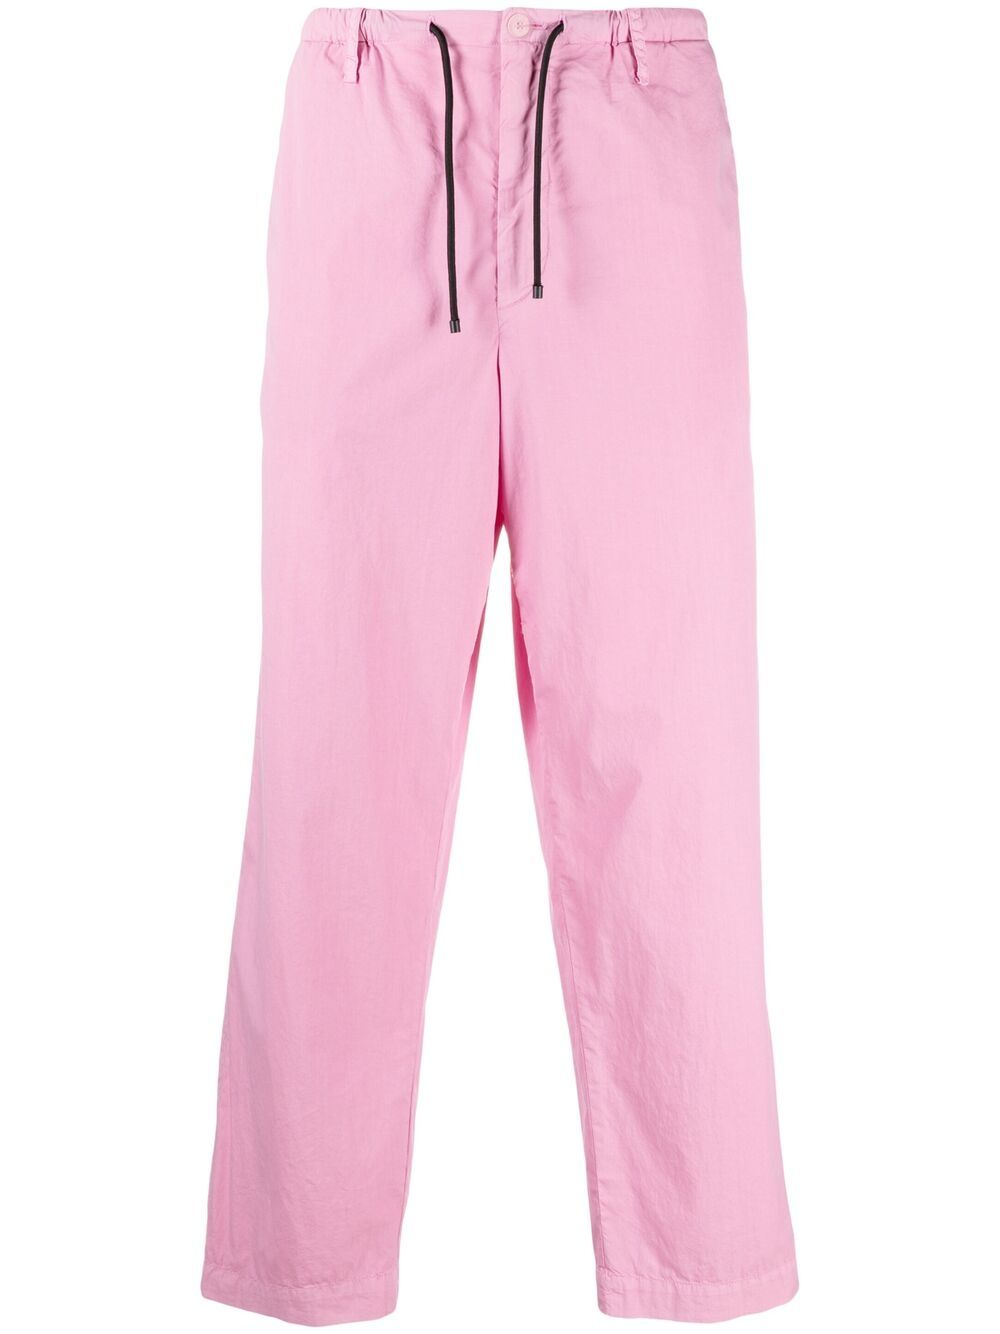 drawstring straight leg trousers man pink cotton DRIES VAN NOTEN | Trousers | PENNY2279PINK